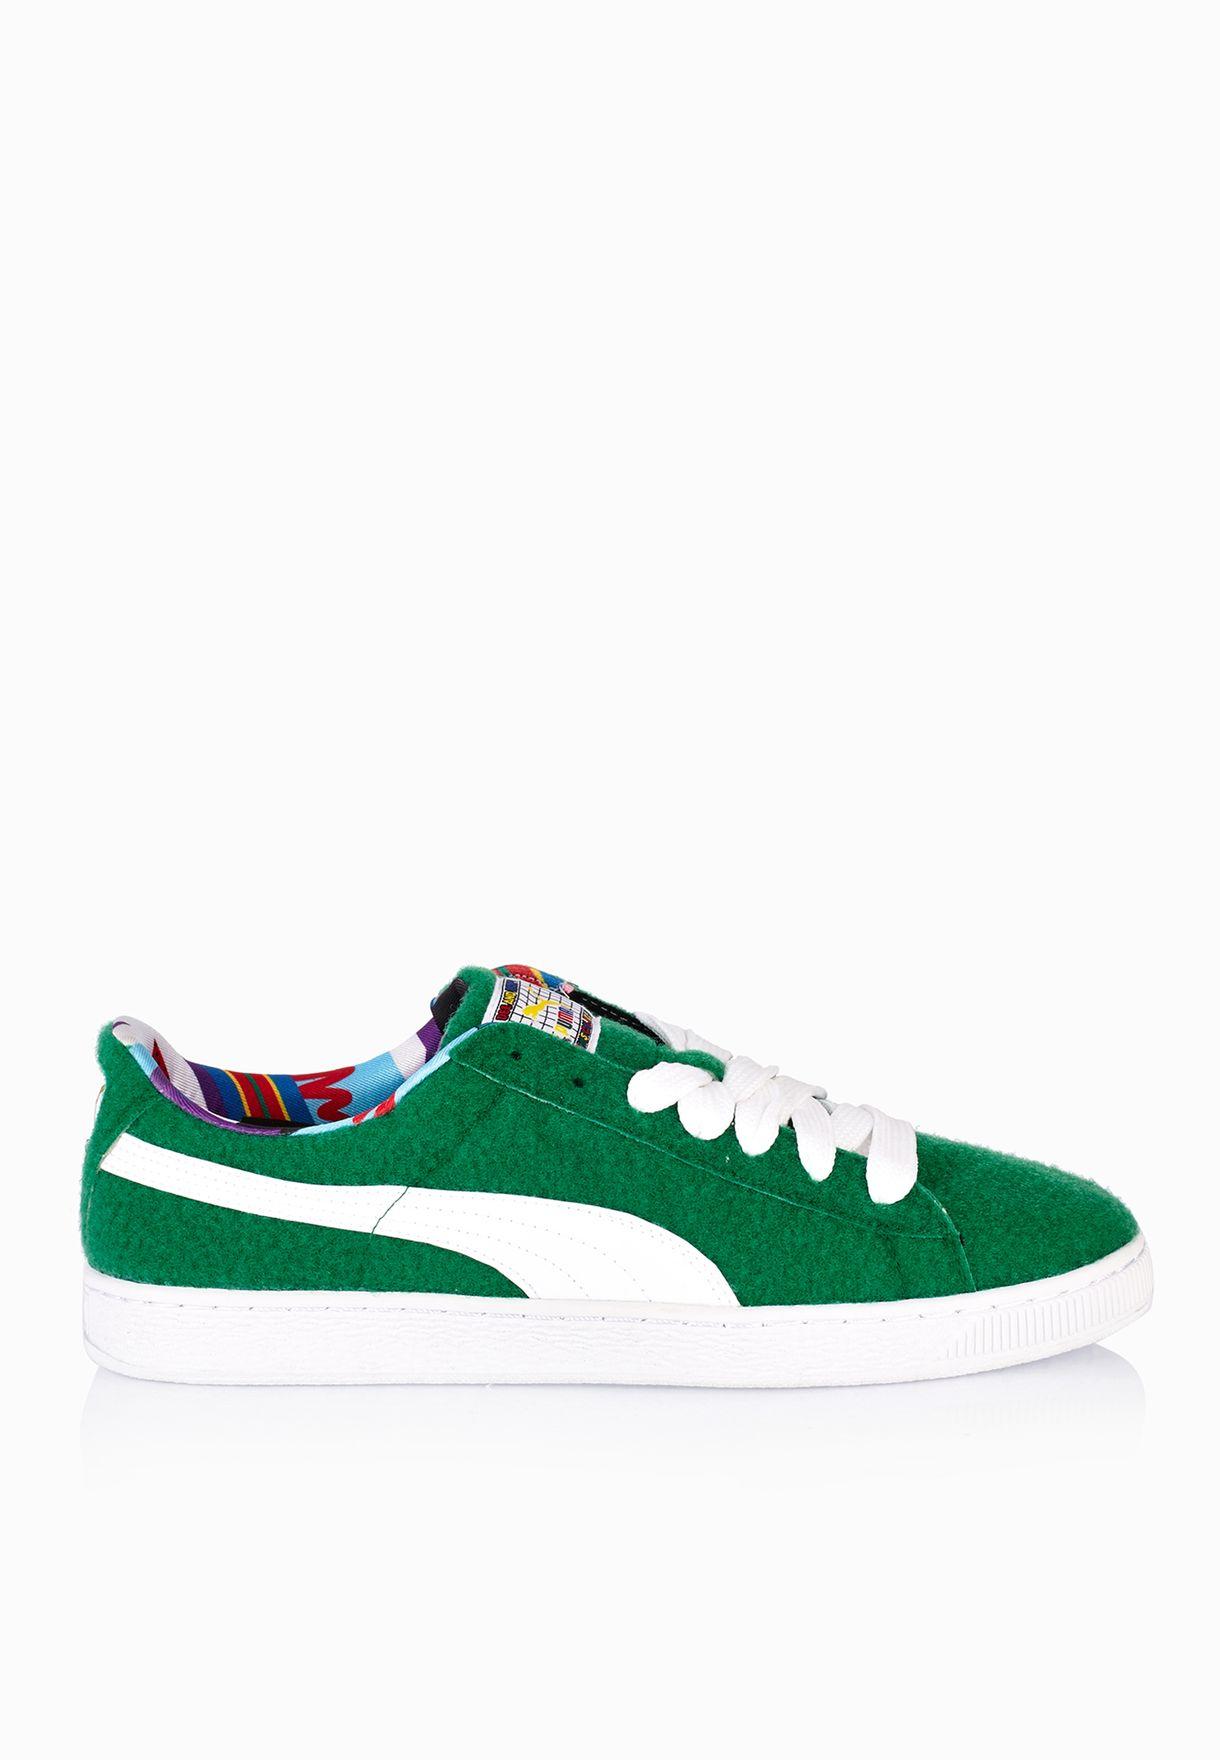 85c230152f2 Shop PUMA green Basket X Dee  amp  Ricky CR 36008402 for Men in ...